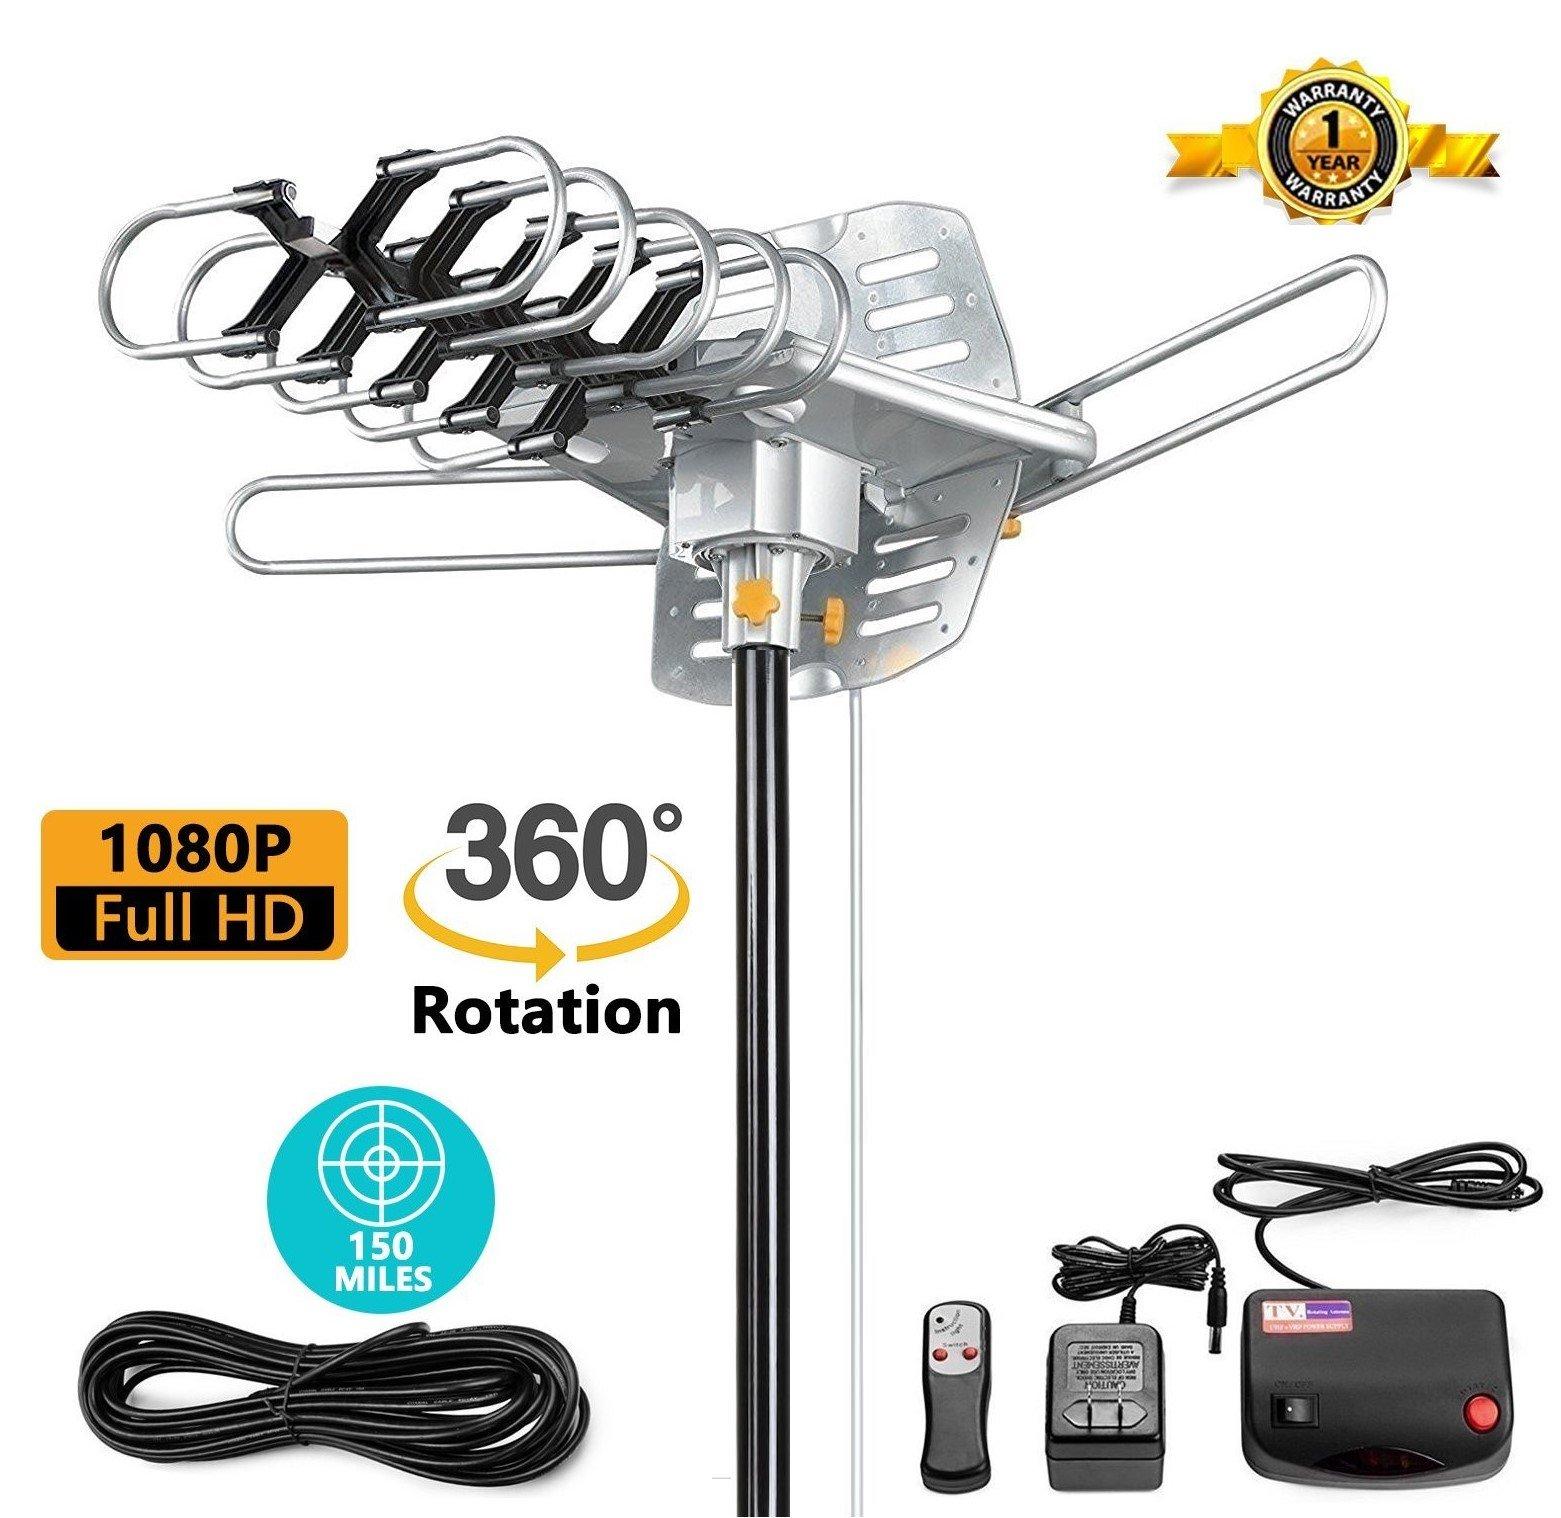 Vilso TV Antenna Outdoor Amplified - Motorized 360 Degree Rotation - Digital HDTV Antenna - 150 Miles Range - Wireless infrared Remote (Non Mount Pole)